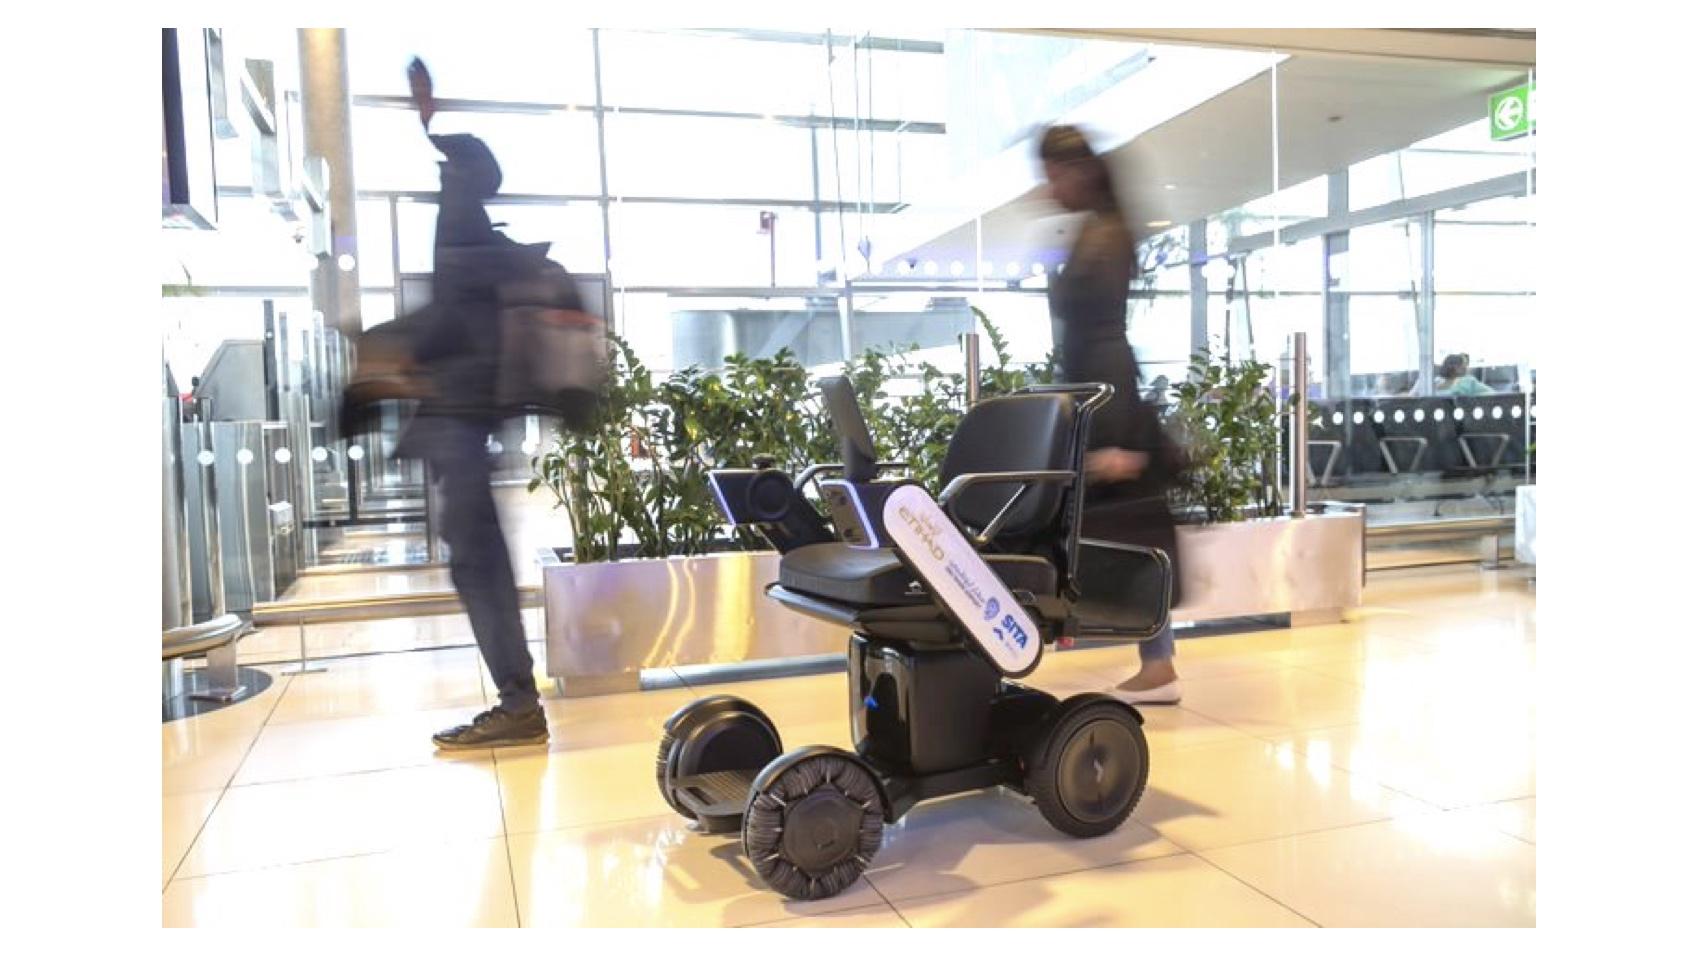 WHILL | 国内外の5つの空港で自動運転パーソナルモビリティの実証実験を実施、CES2020にも展示予定